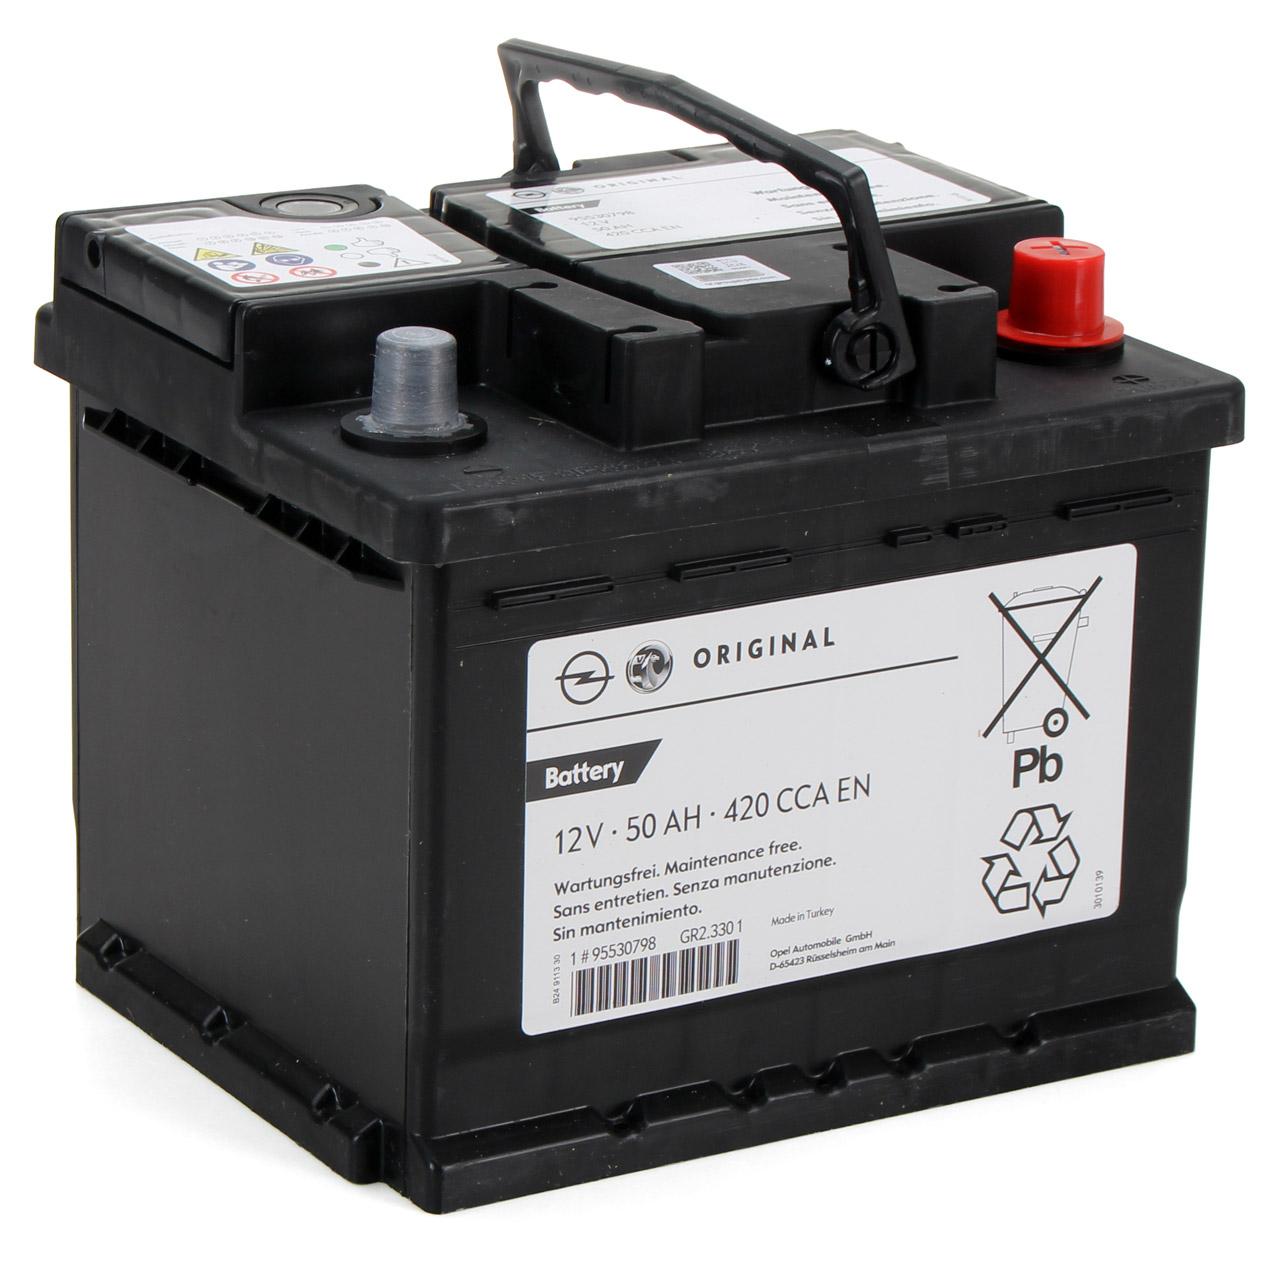 ORIGINAL GM Opel Autobatterie Batterie Starterbatterie 12V 50Ah 420A 95527530